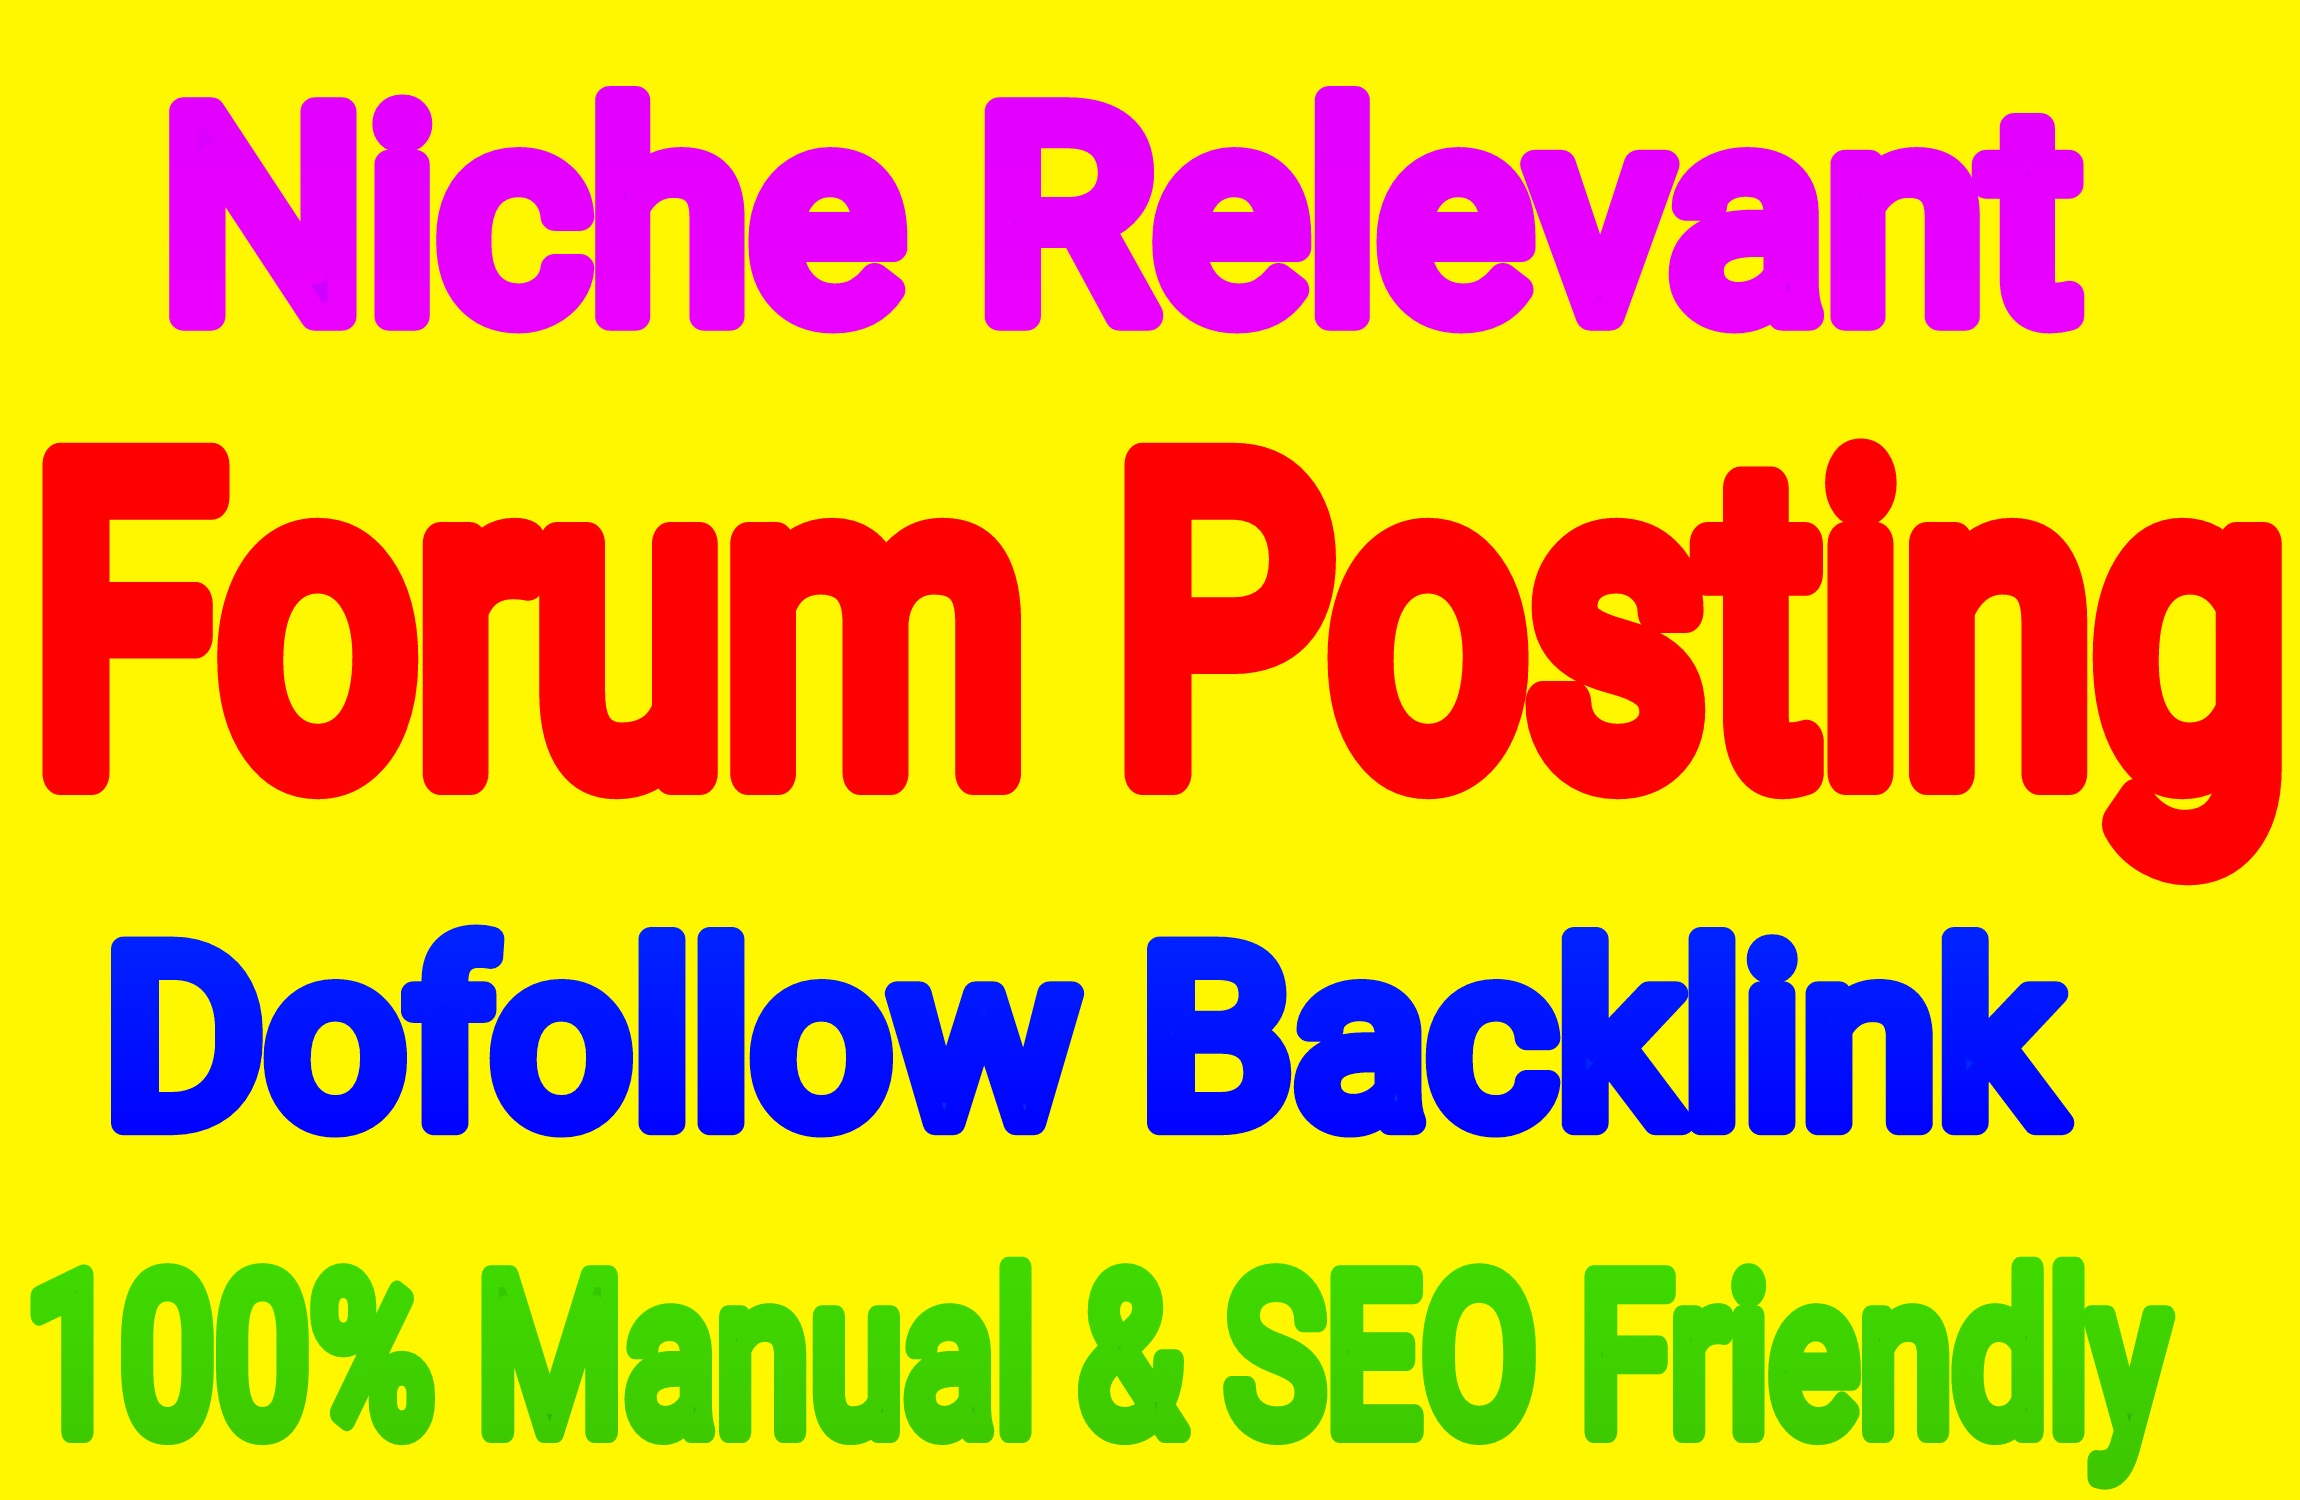 Do 100 Niche Relevant Forum Posting Backlinks Service Provider